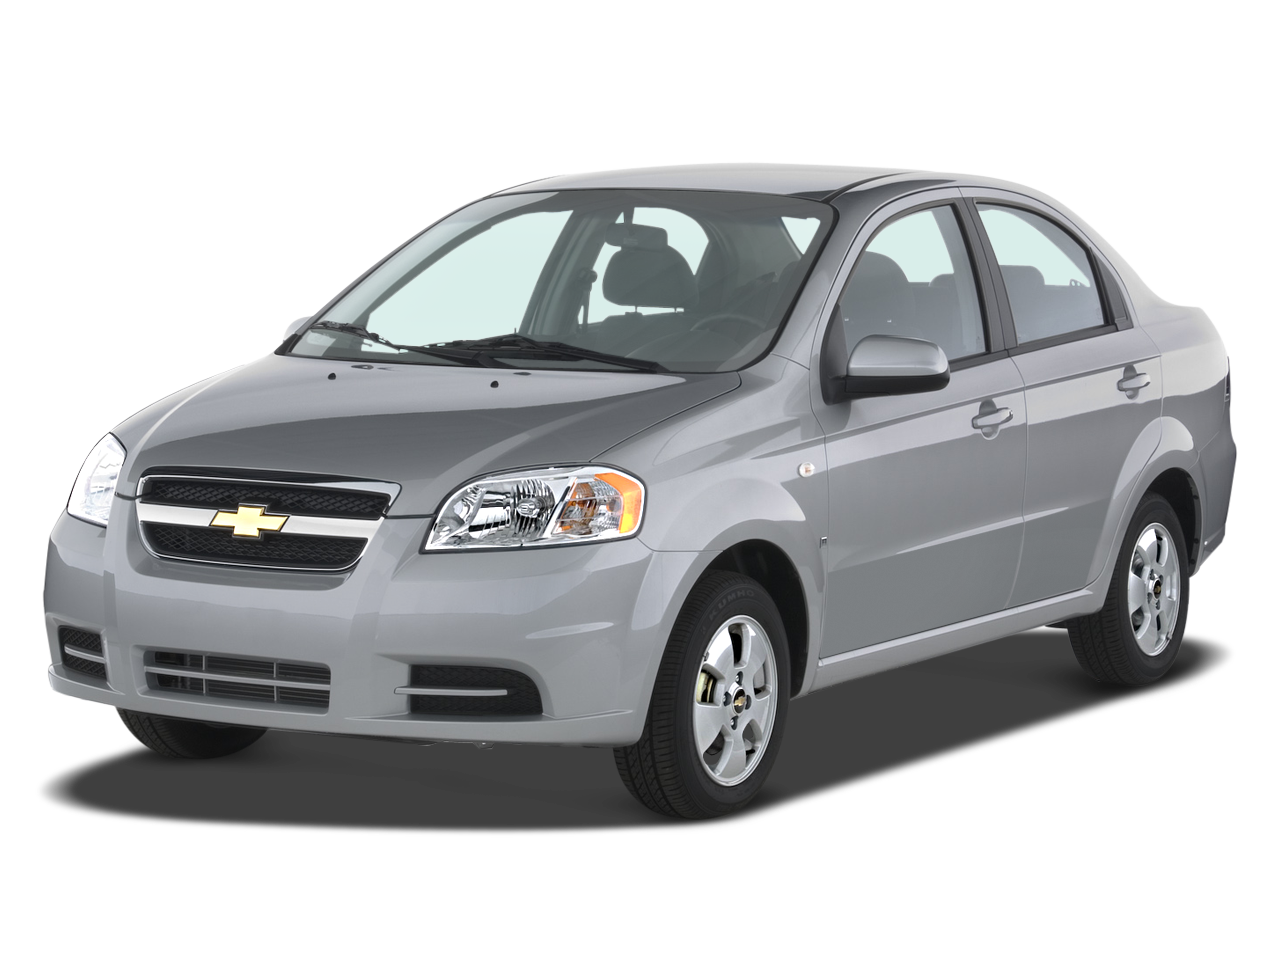 Automotive Air Conditioning - History of Automotive A/C - Automobile